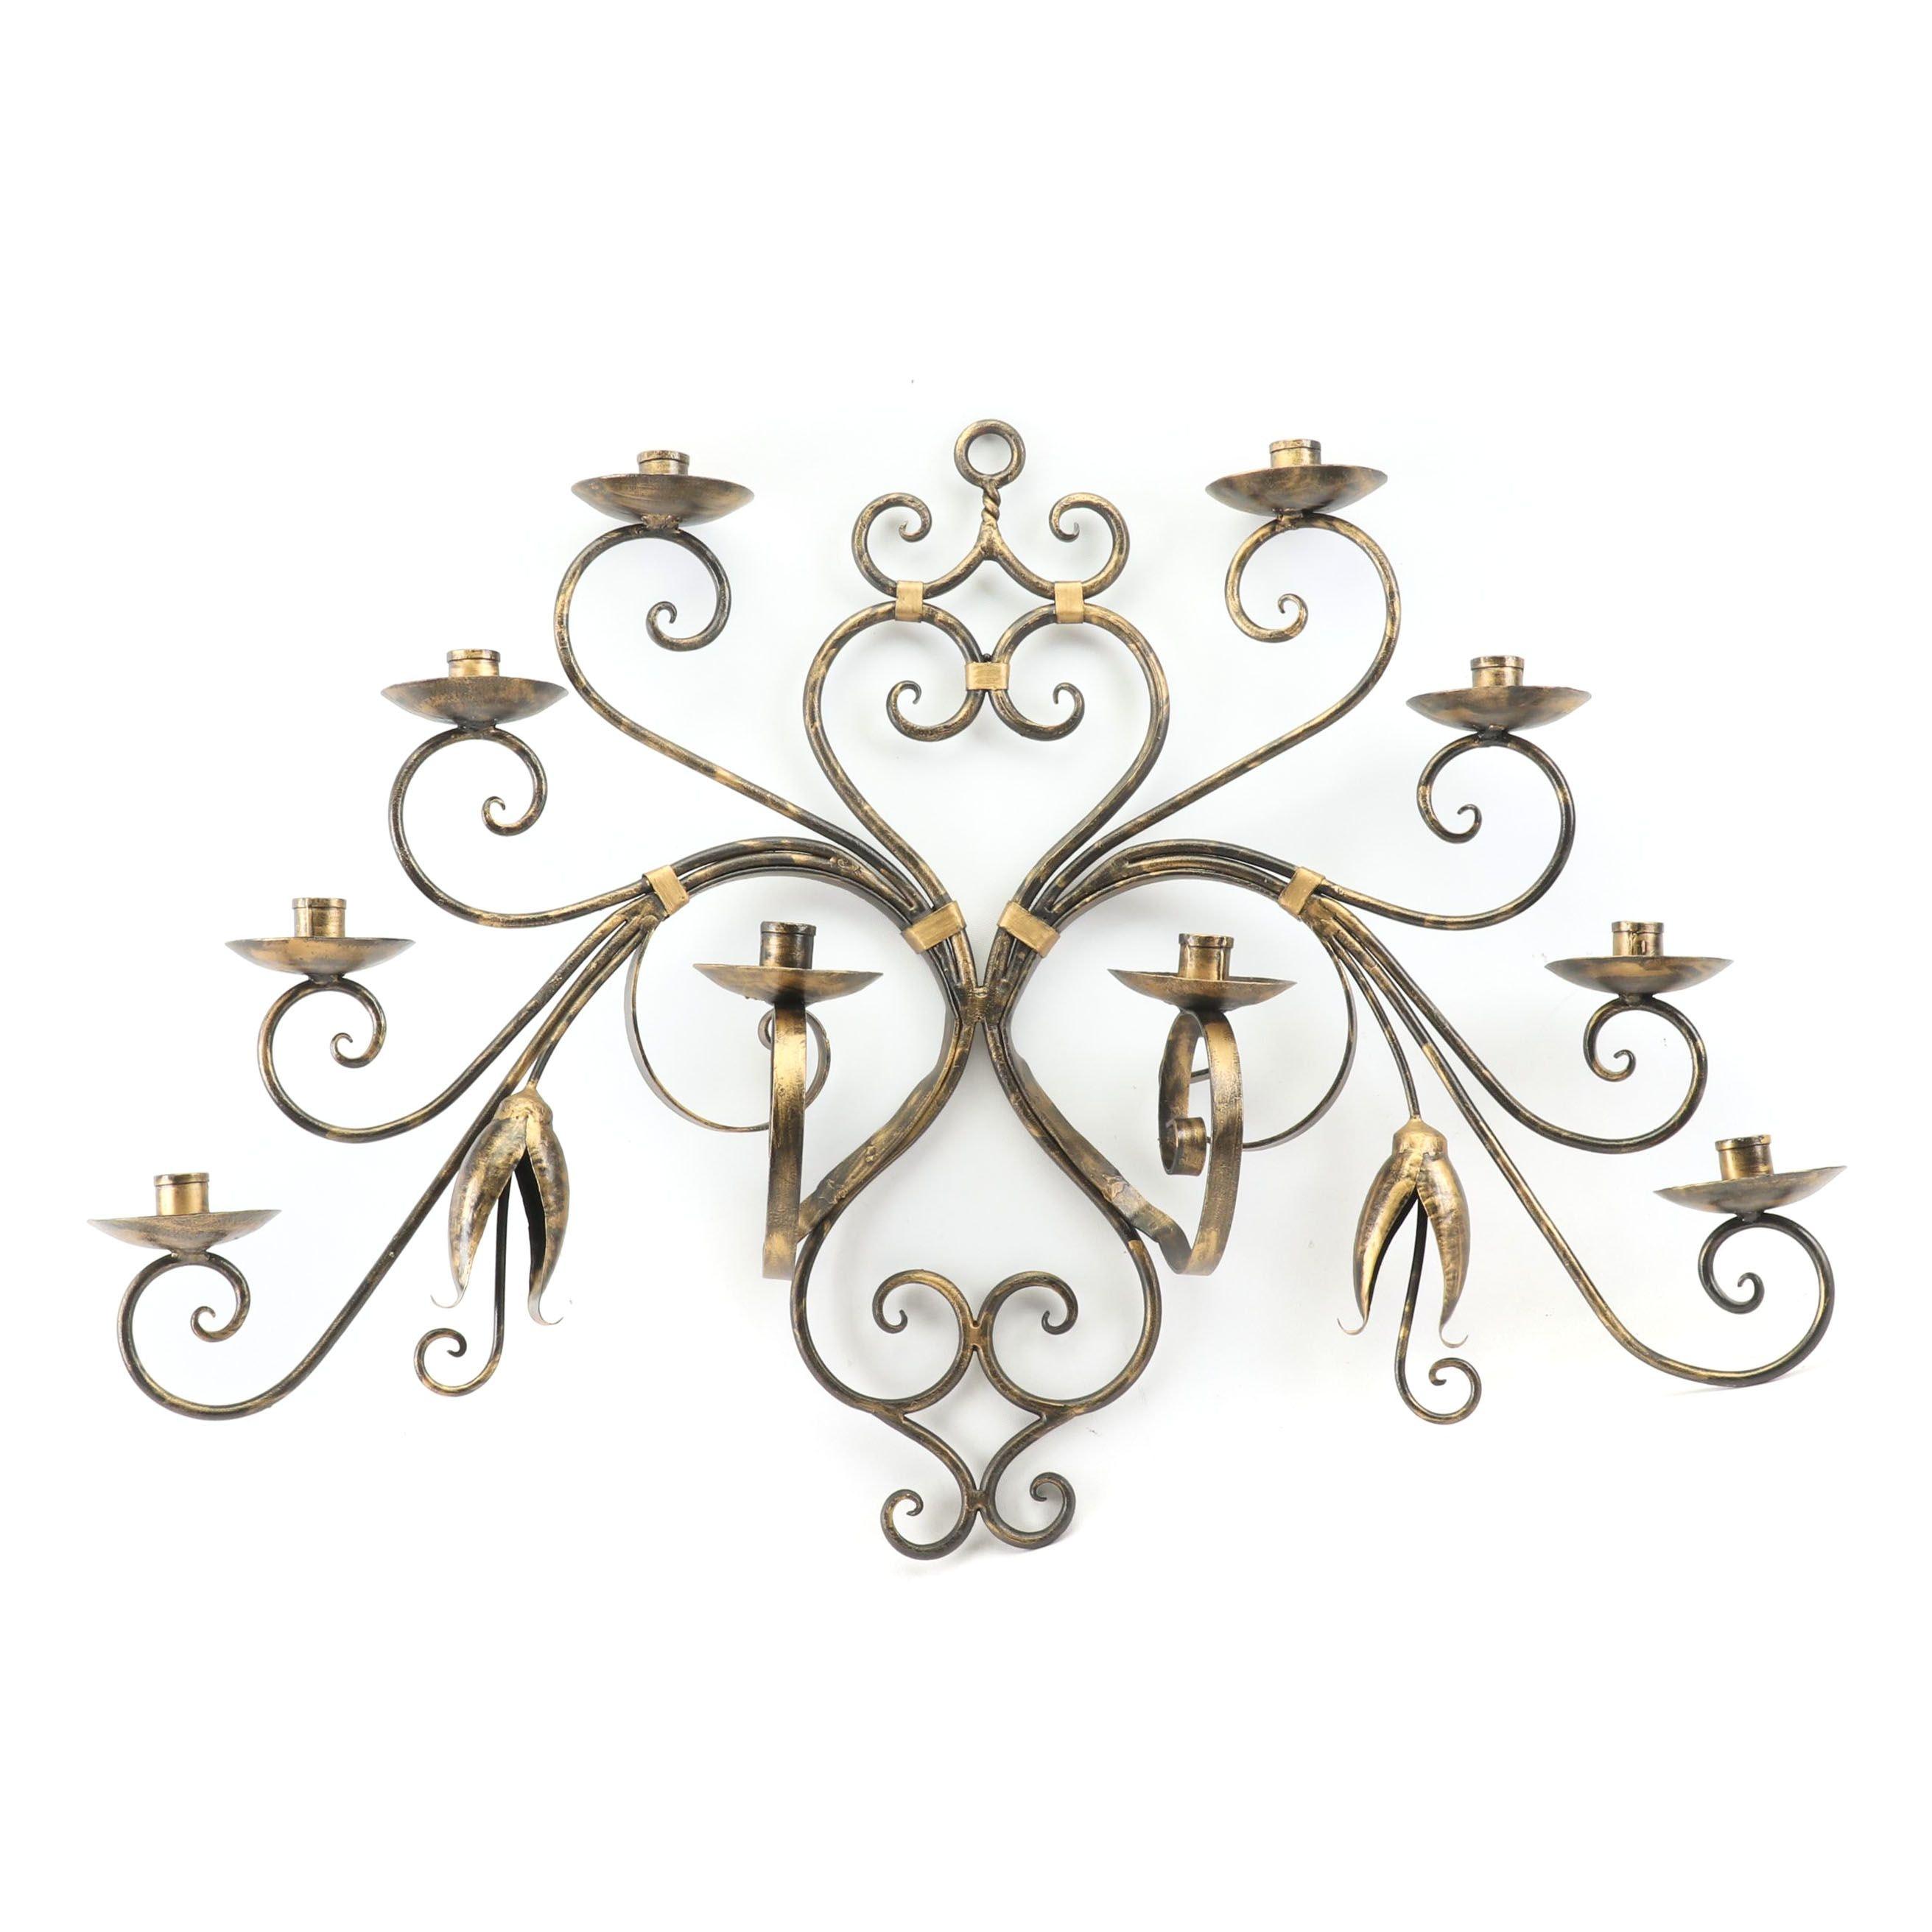 Decorative Metal Hanging Candelabra